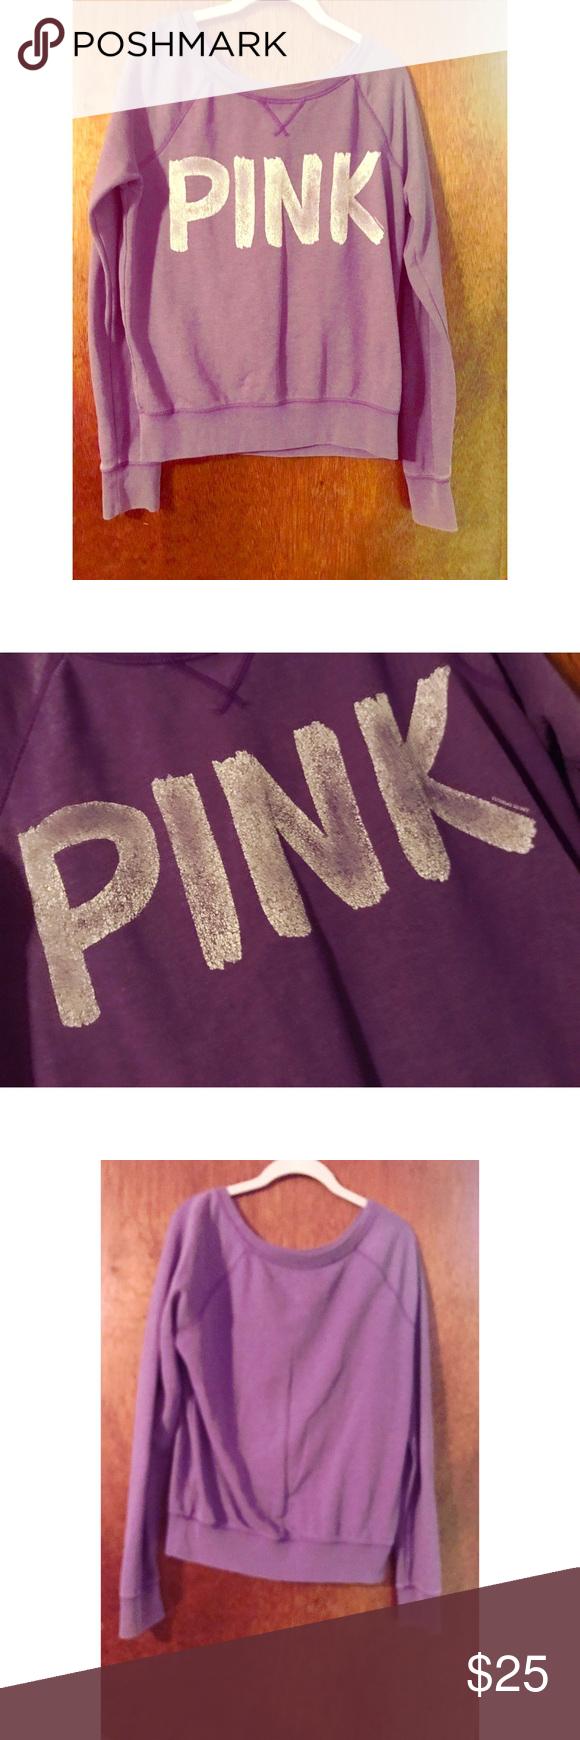 Victoria's Secret PINK Purple Sweater w/ Graphic | Pink purple and ...